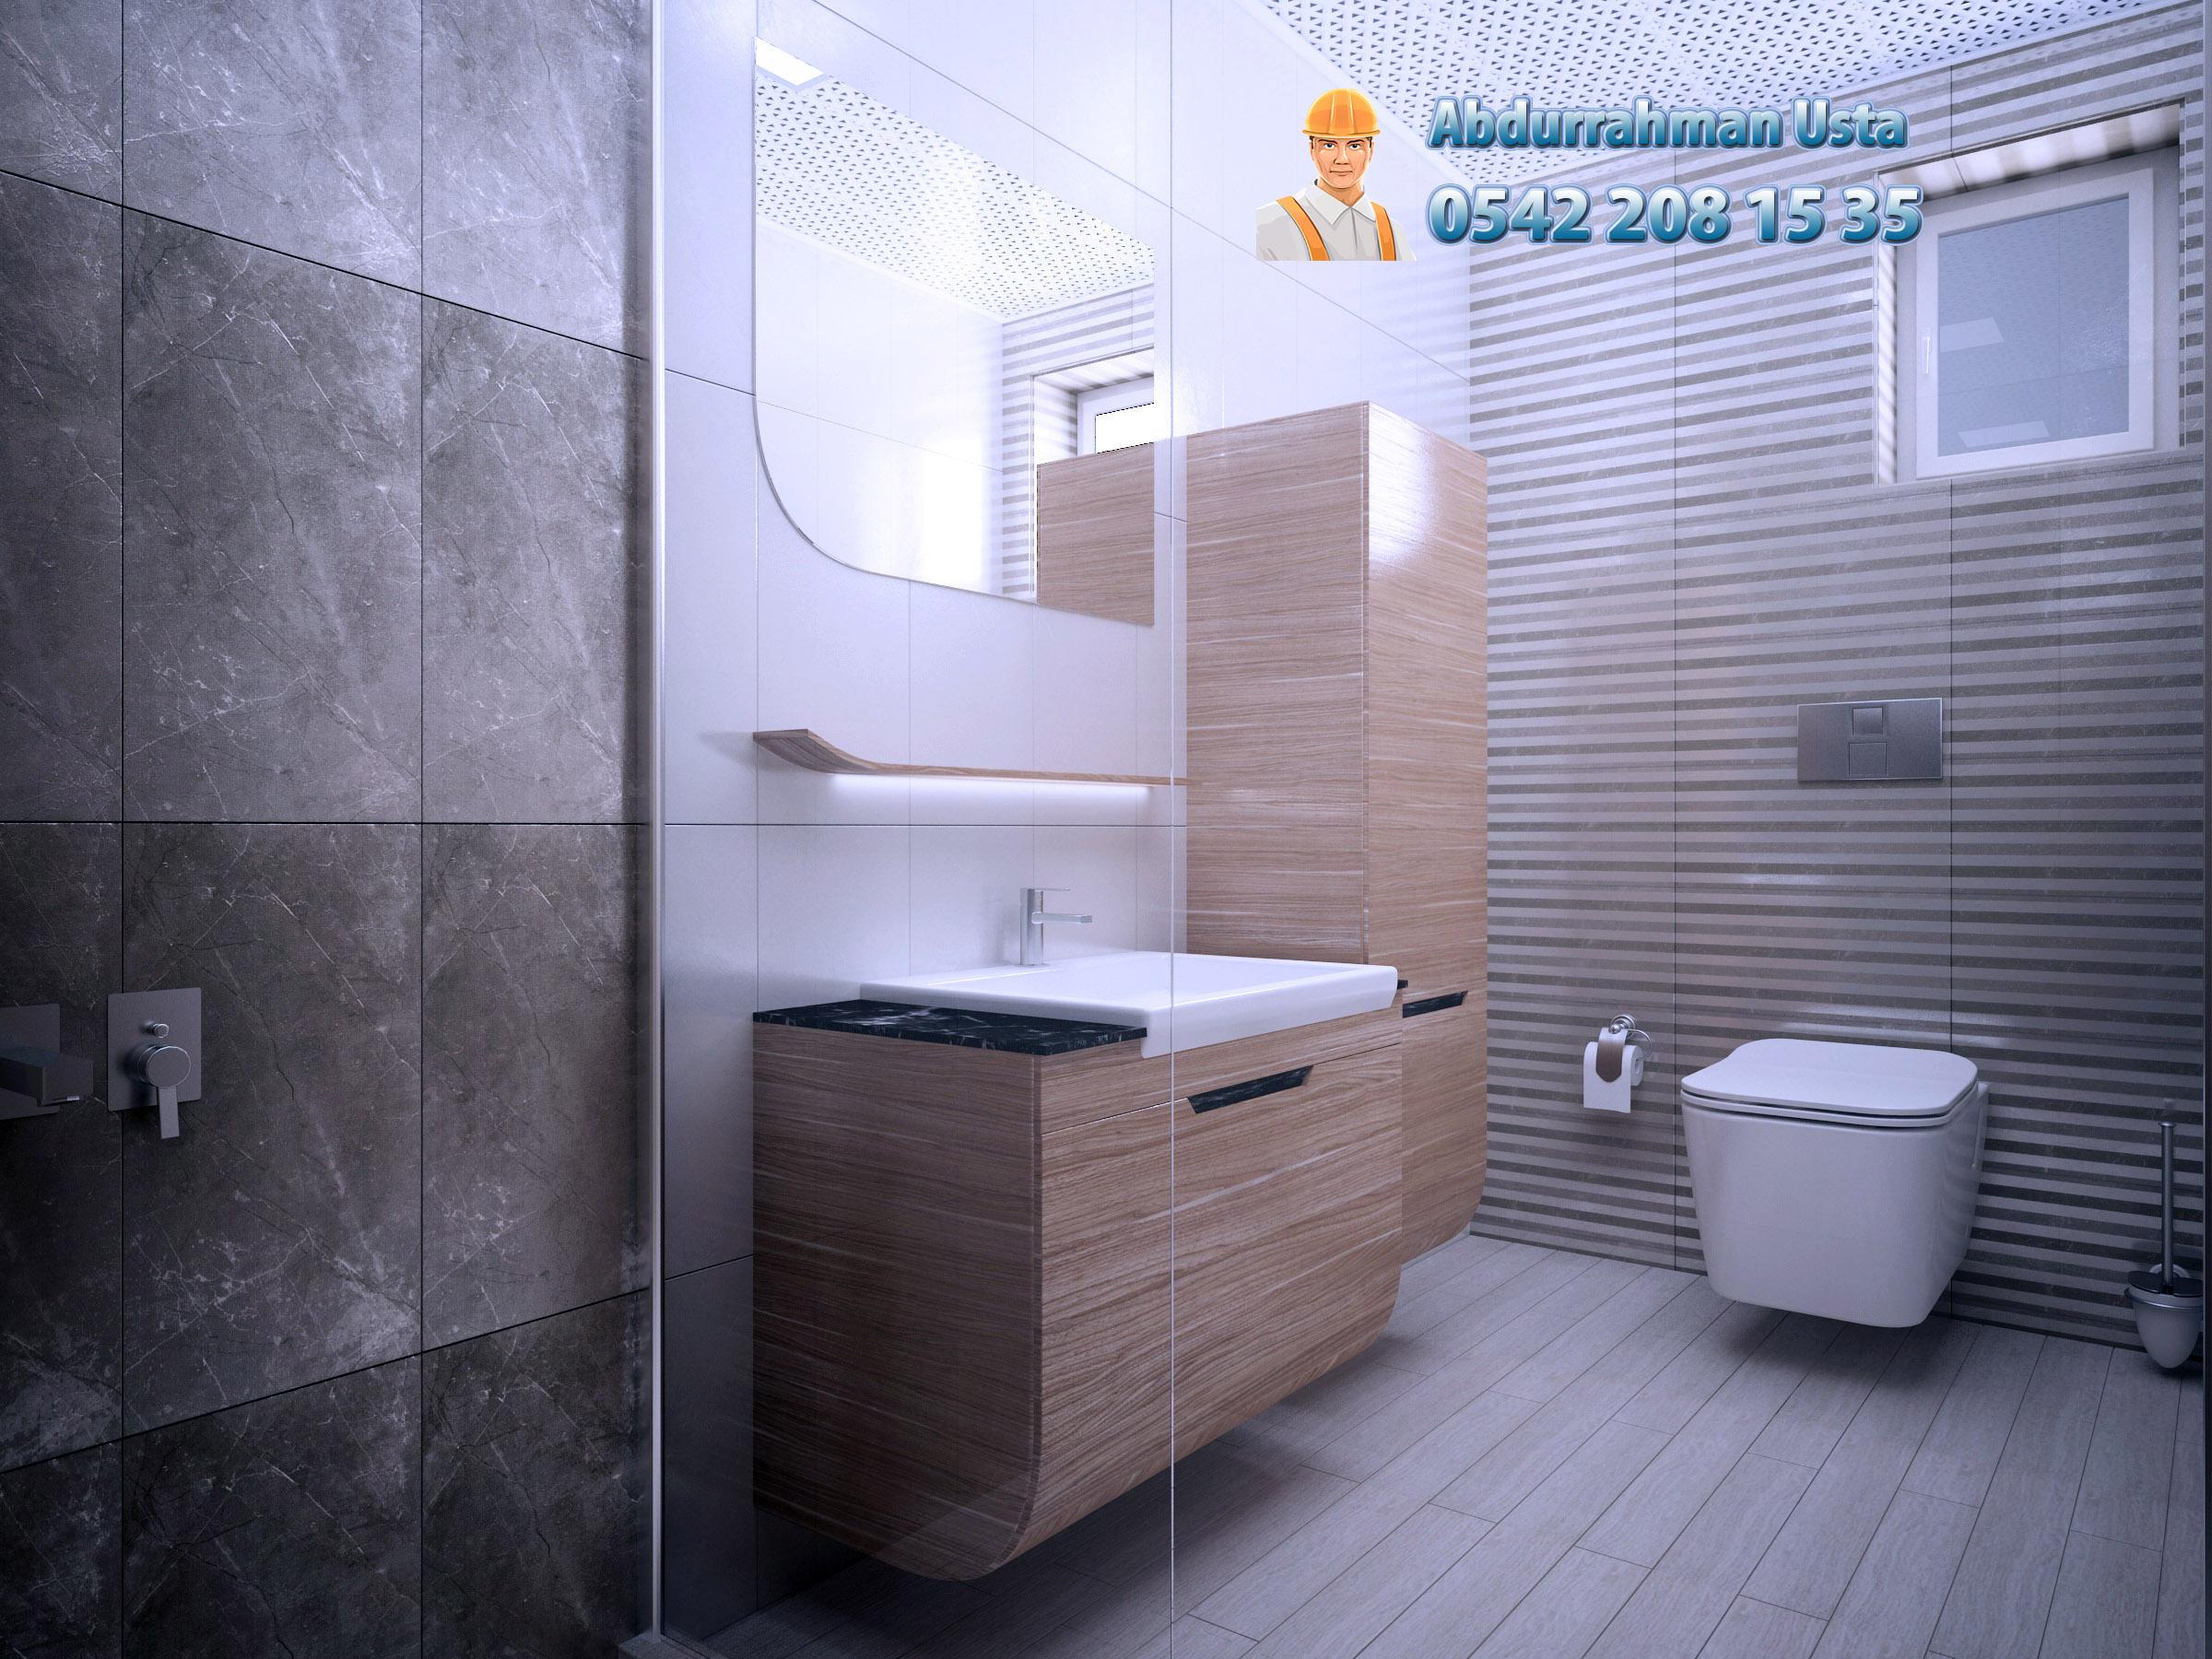 bursa osman gazi banyo, tuvalet fayans ustası